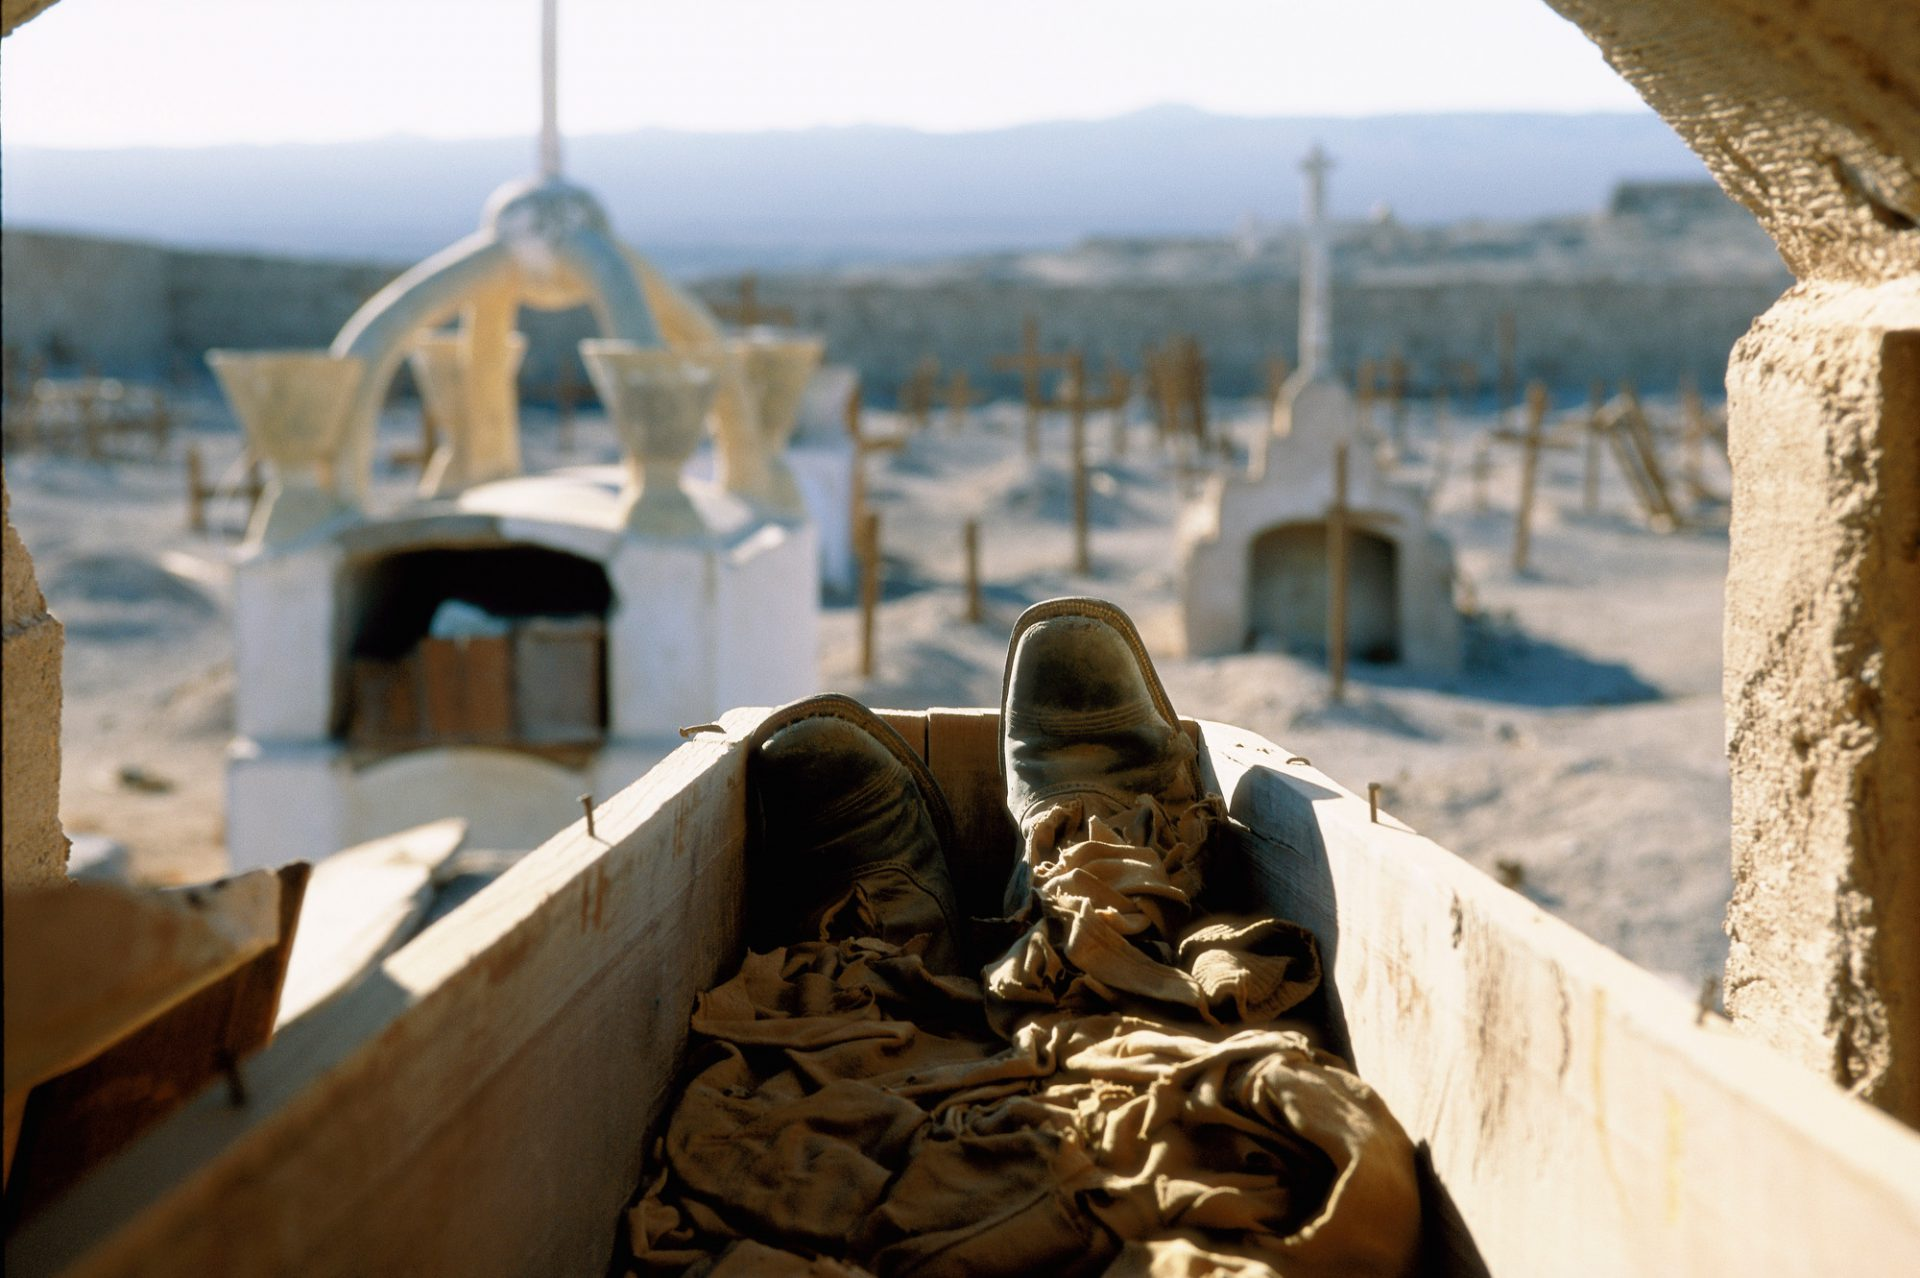 Photo: Abandoned cemetery, Atacama Desert, Chile